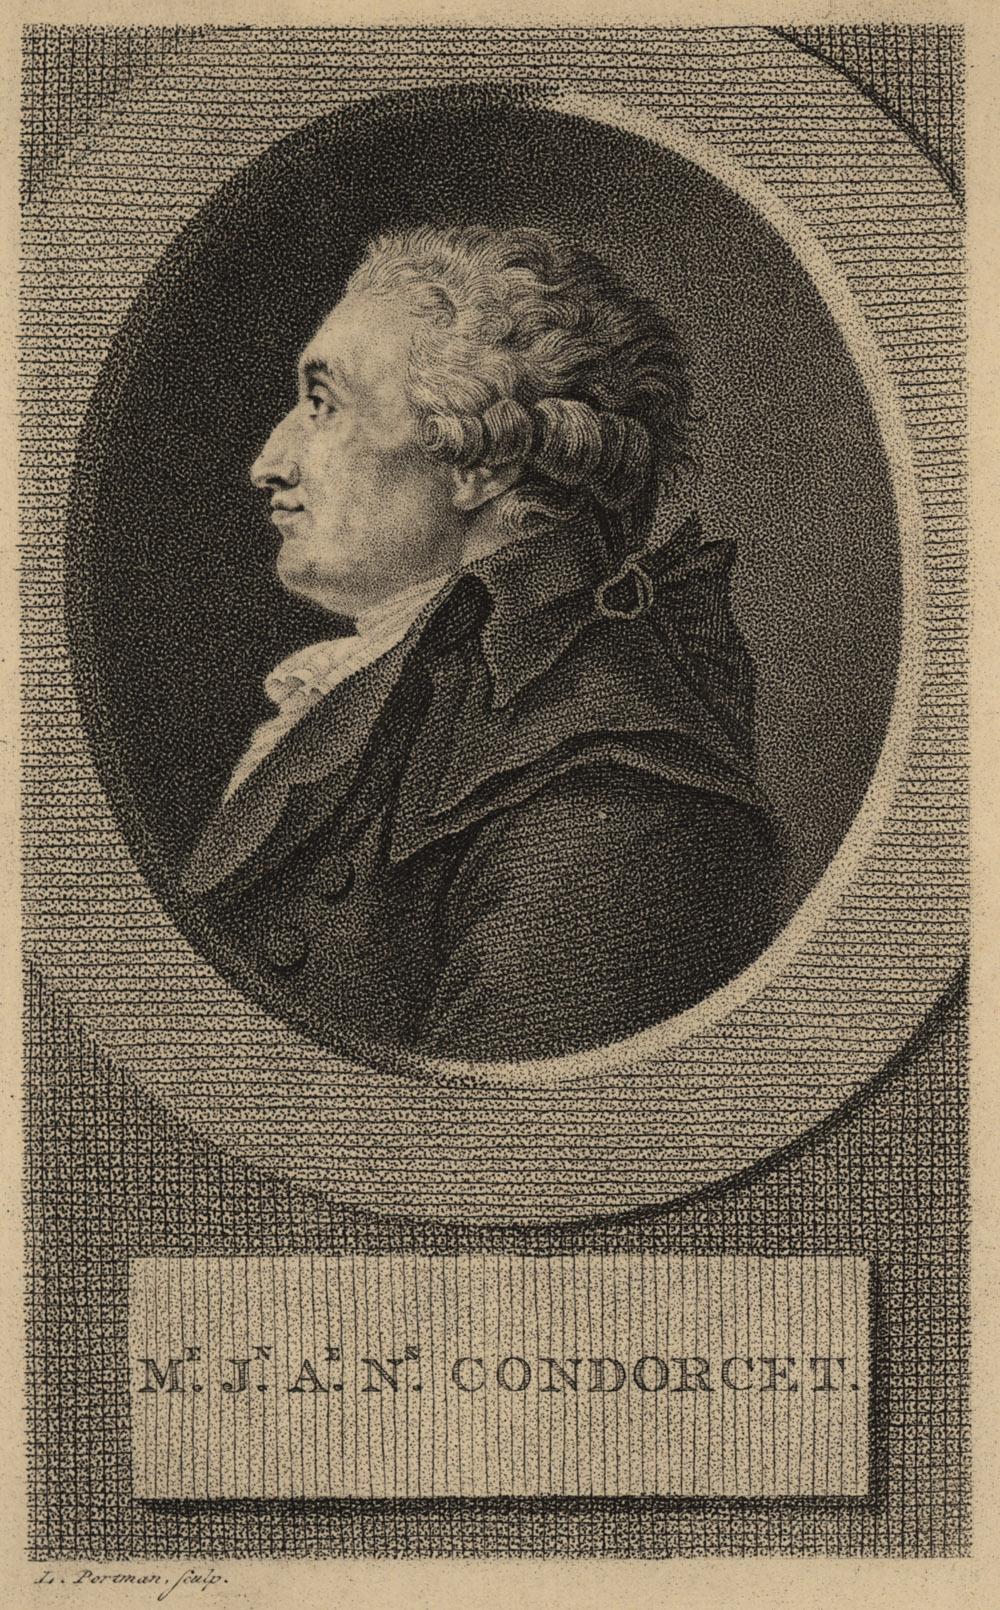 Portrait of Jean-Antoine-Nicolas de Carita Condorcet,  Image number:SIL14-C5-02a